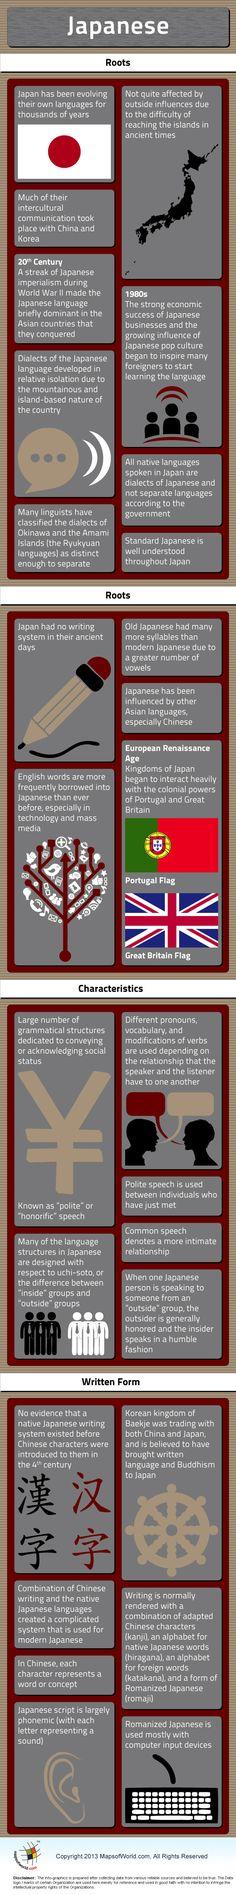 Japanese Language – Facts & Infographic